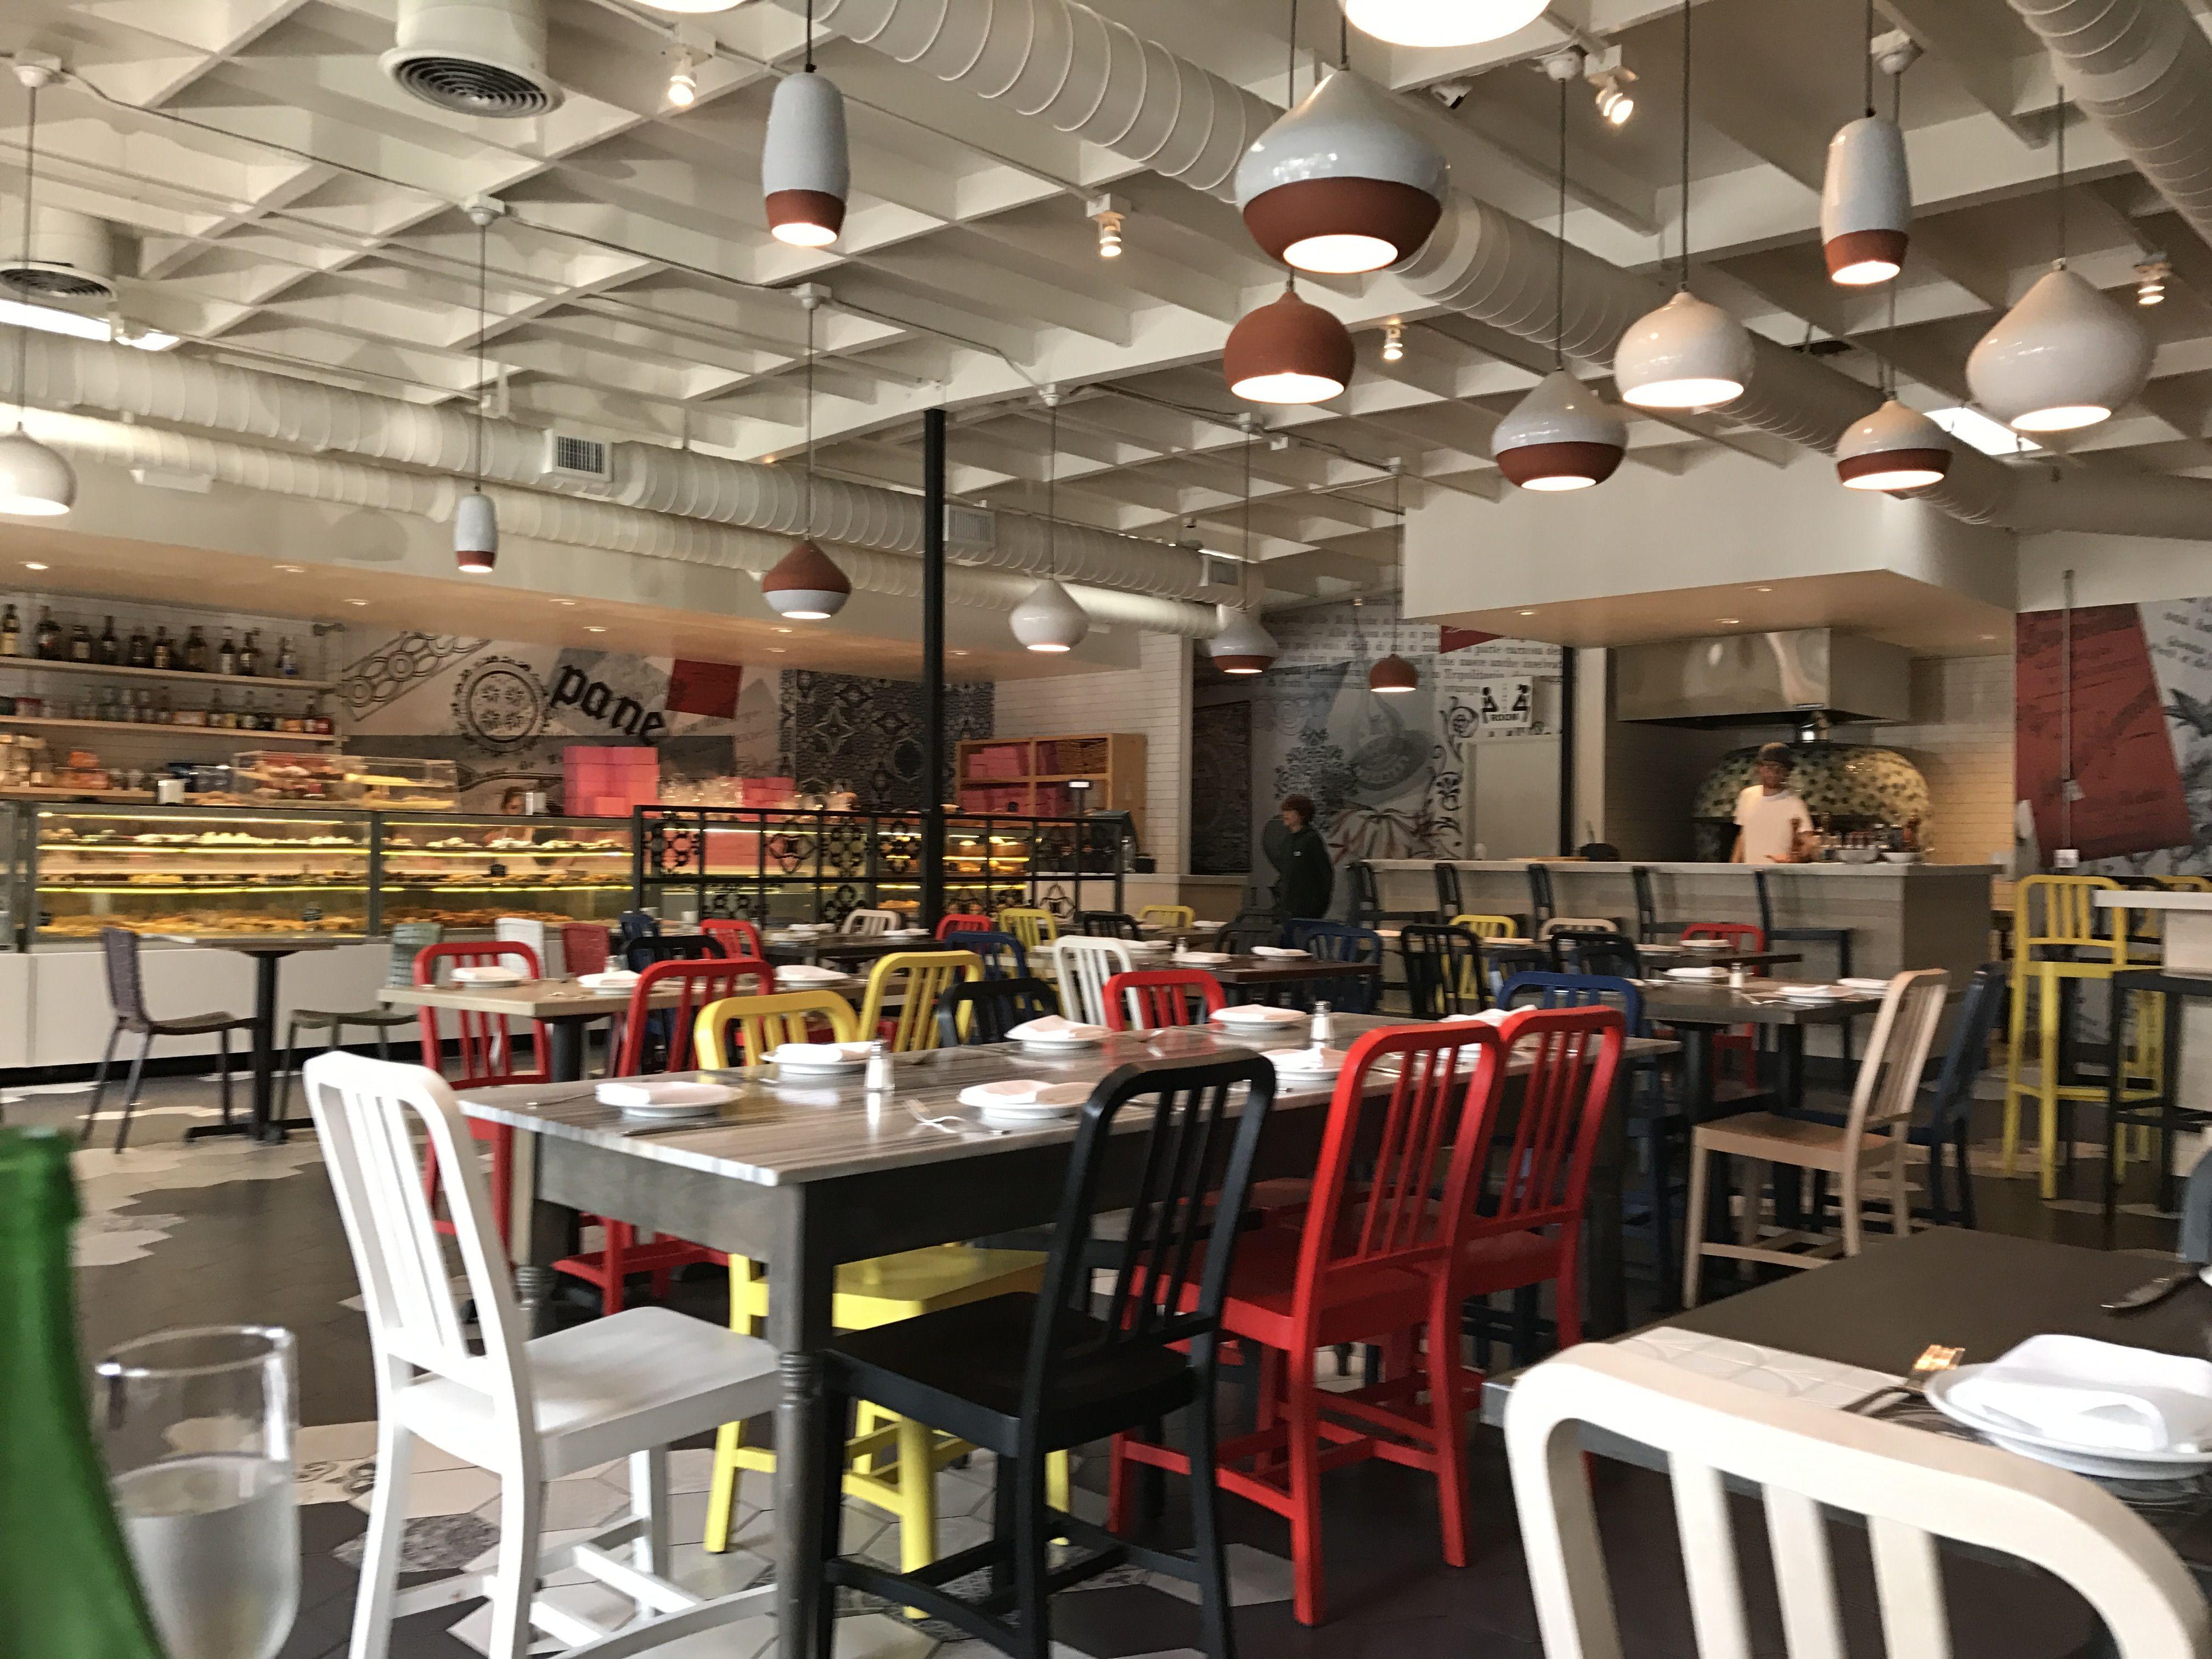 Solunto Restaurant in Little Italy